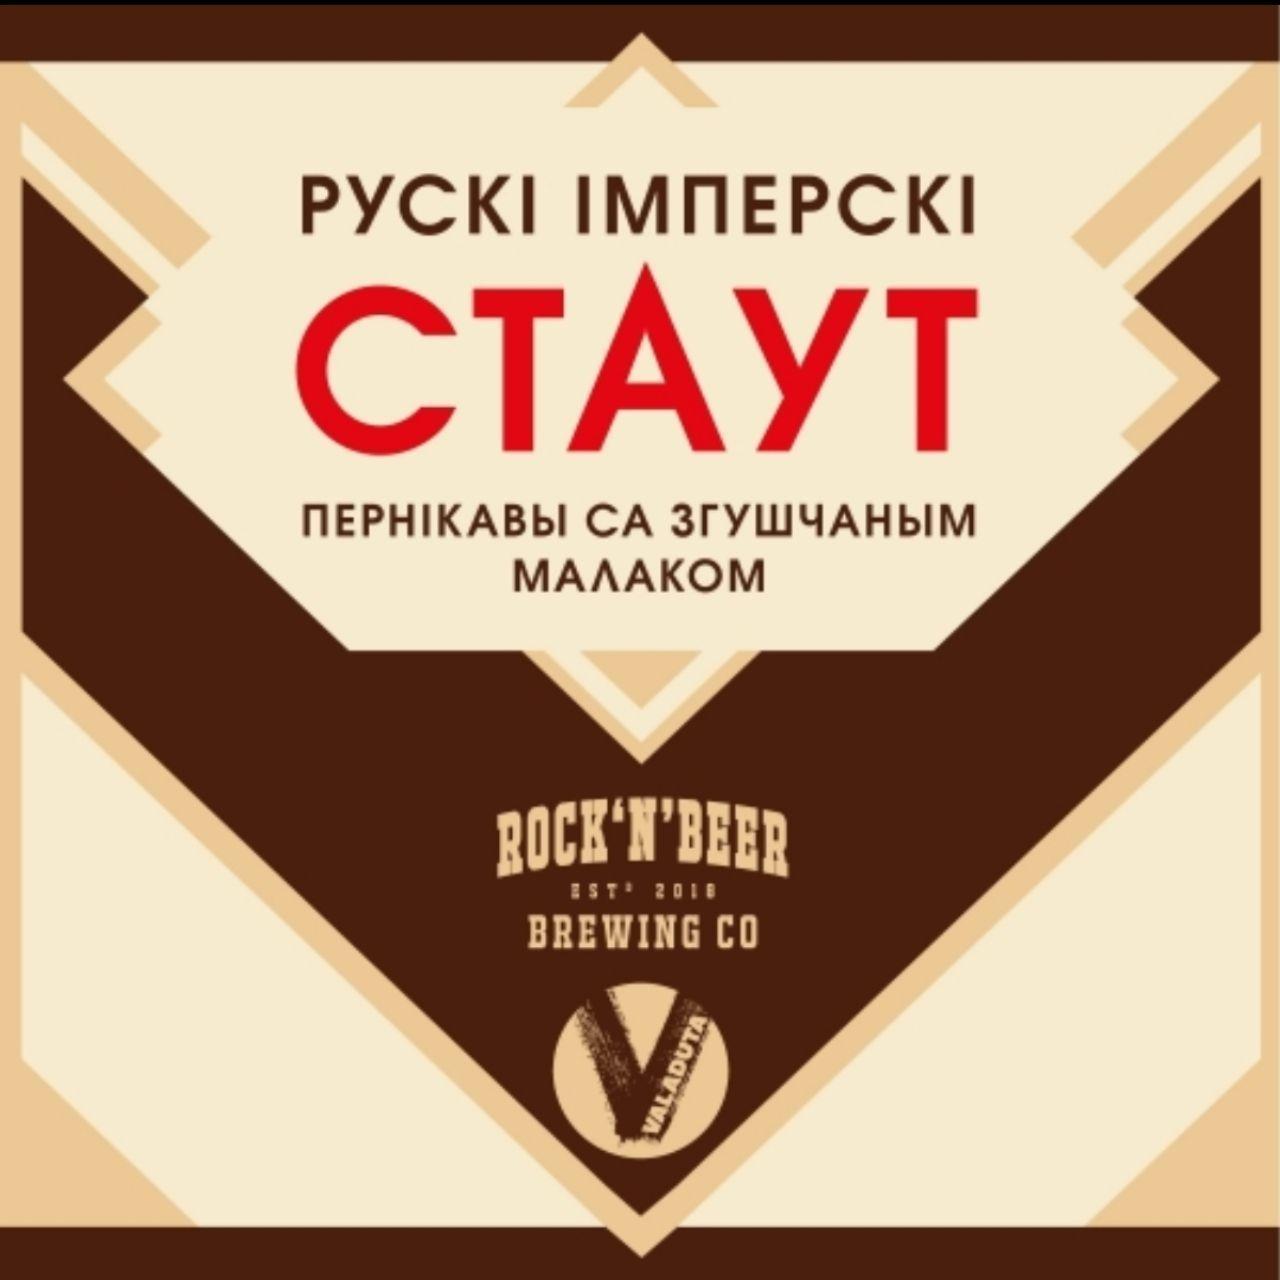 https://static-ru.insales.ru/images/products/1/6401/278976769/photo_2020-01-19_19-38-26.jpg